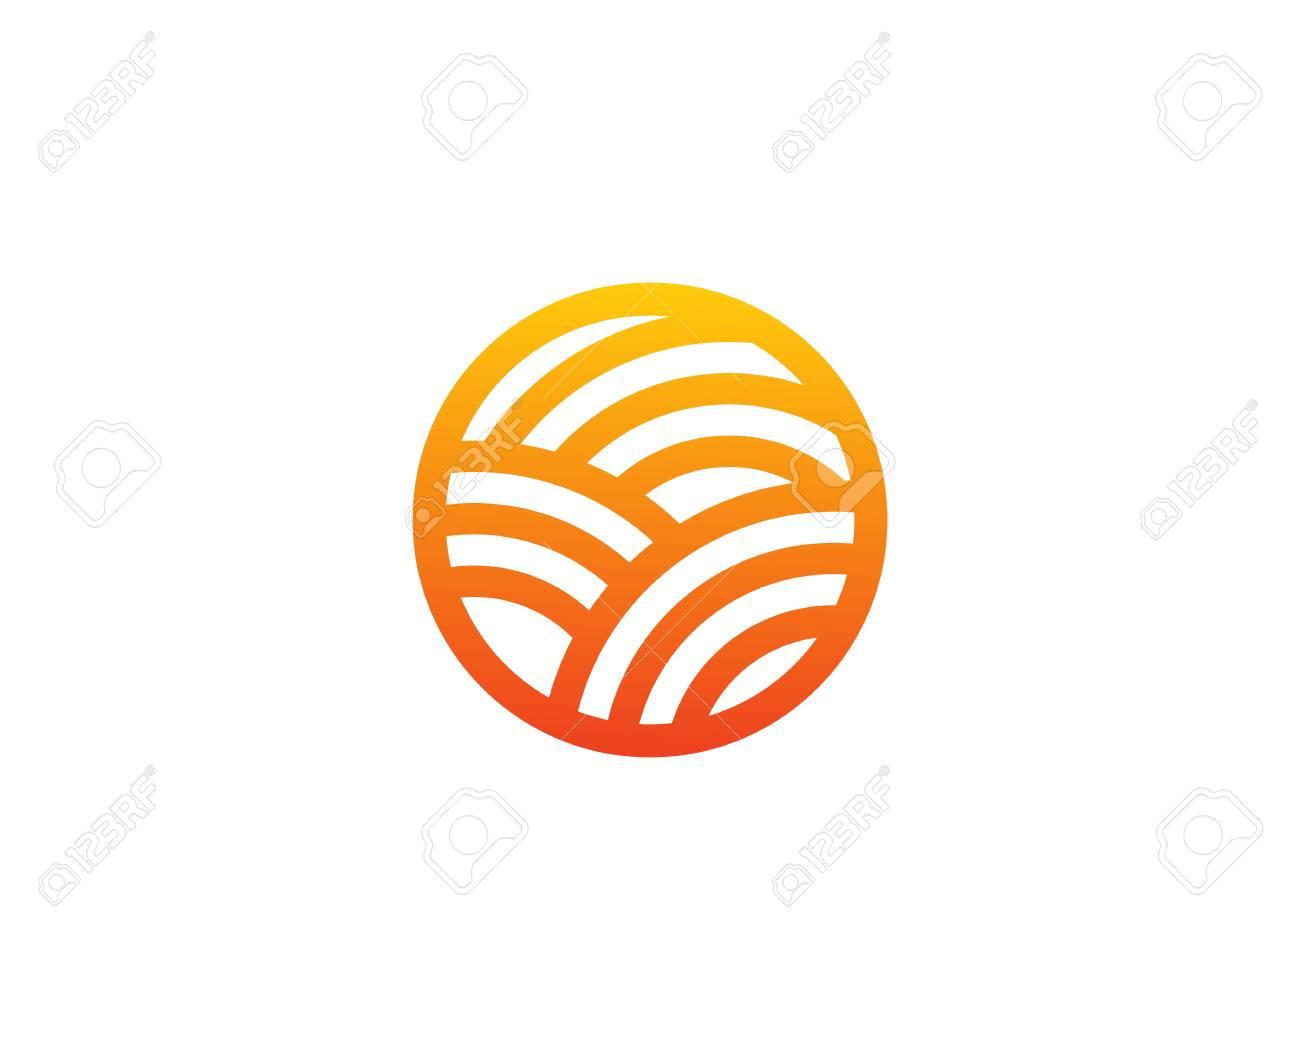 Sun Farm Logo Design Template Royalty Free Cliparts, Vectors, And ...